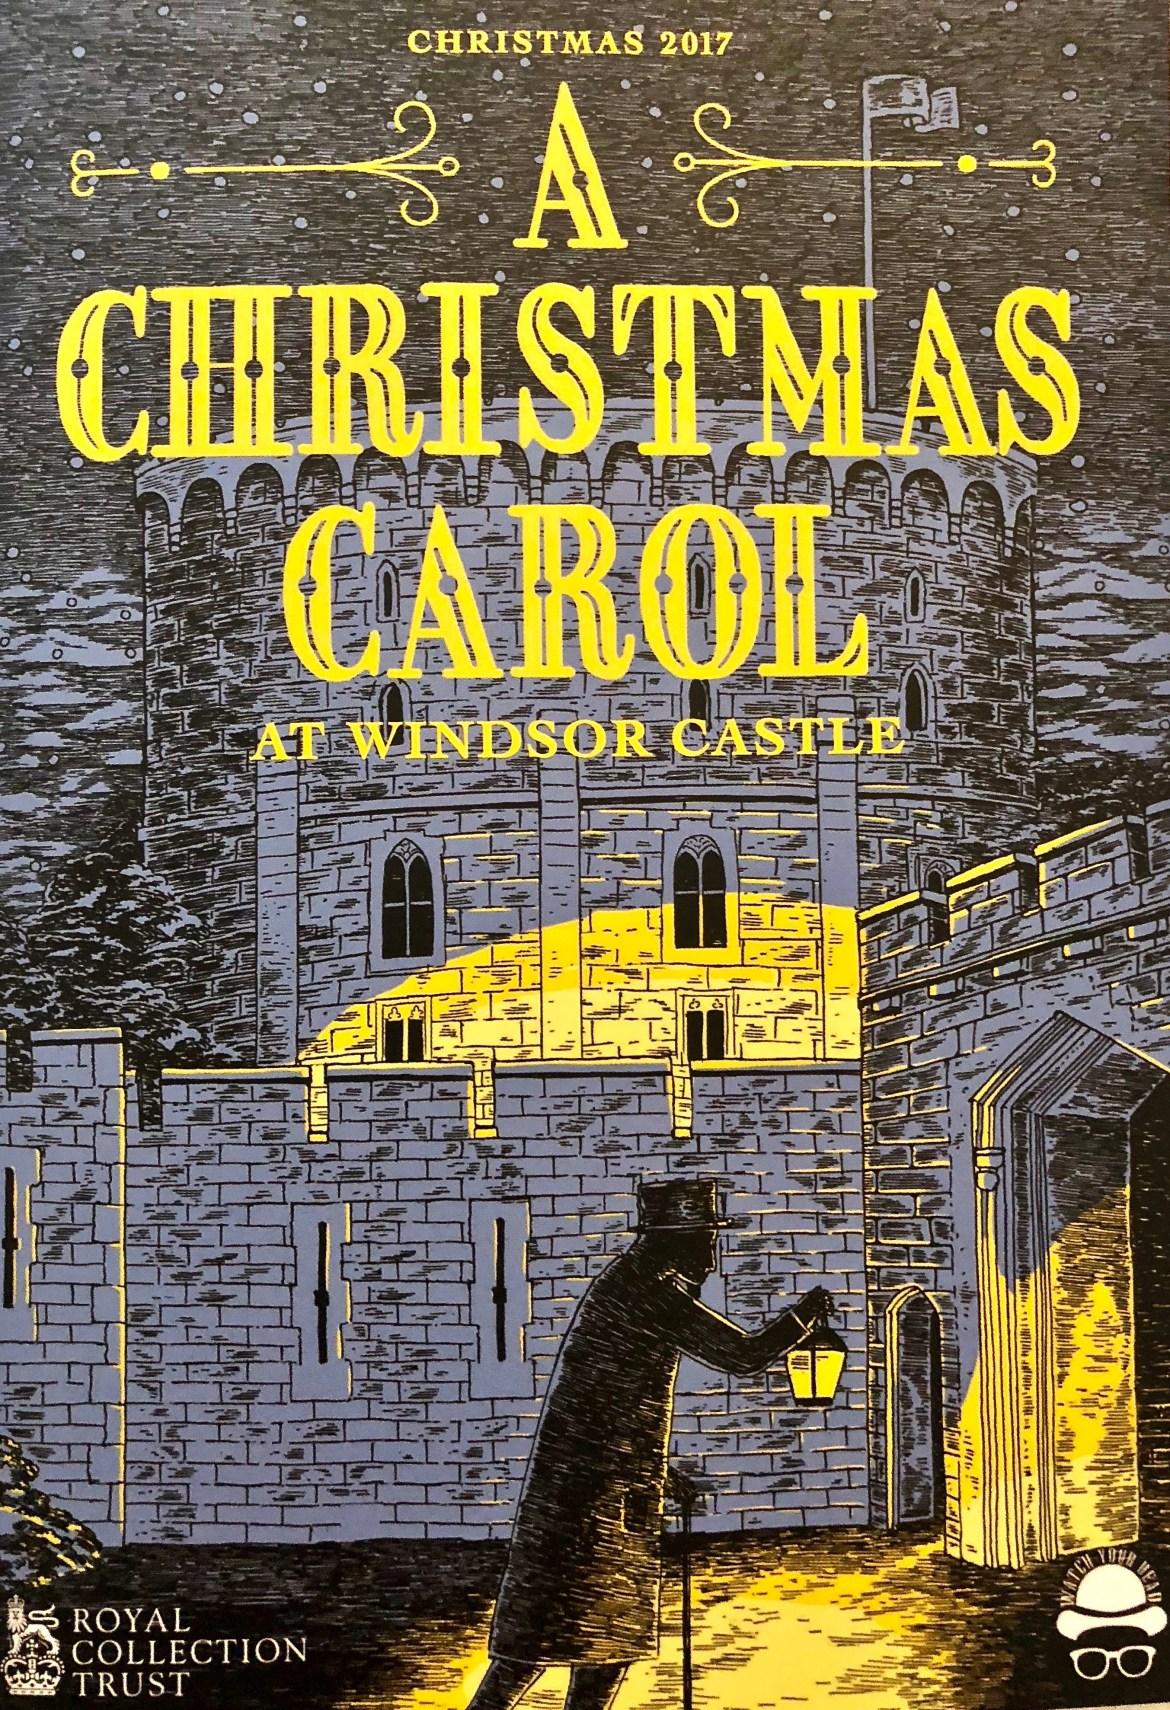 A Christmas Carol at Windsor Castle